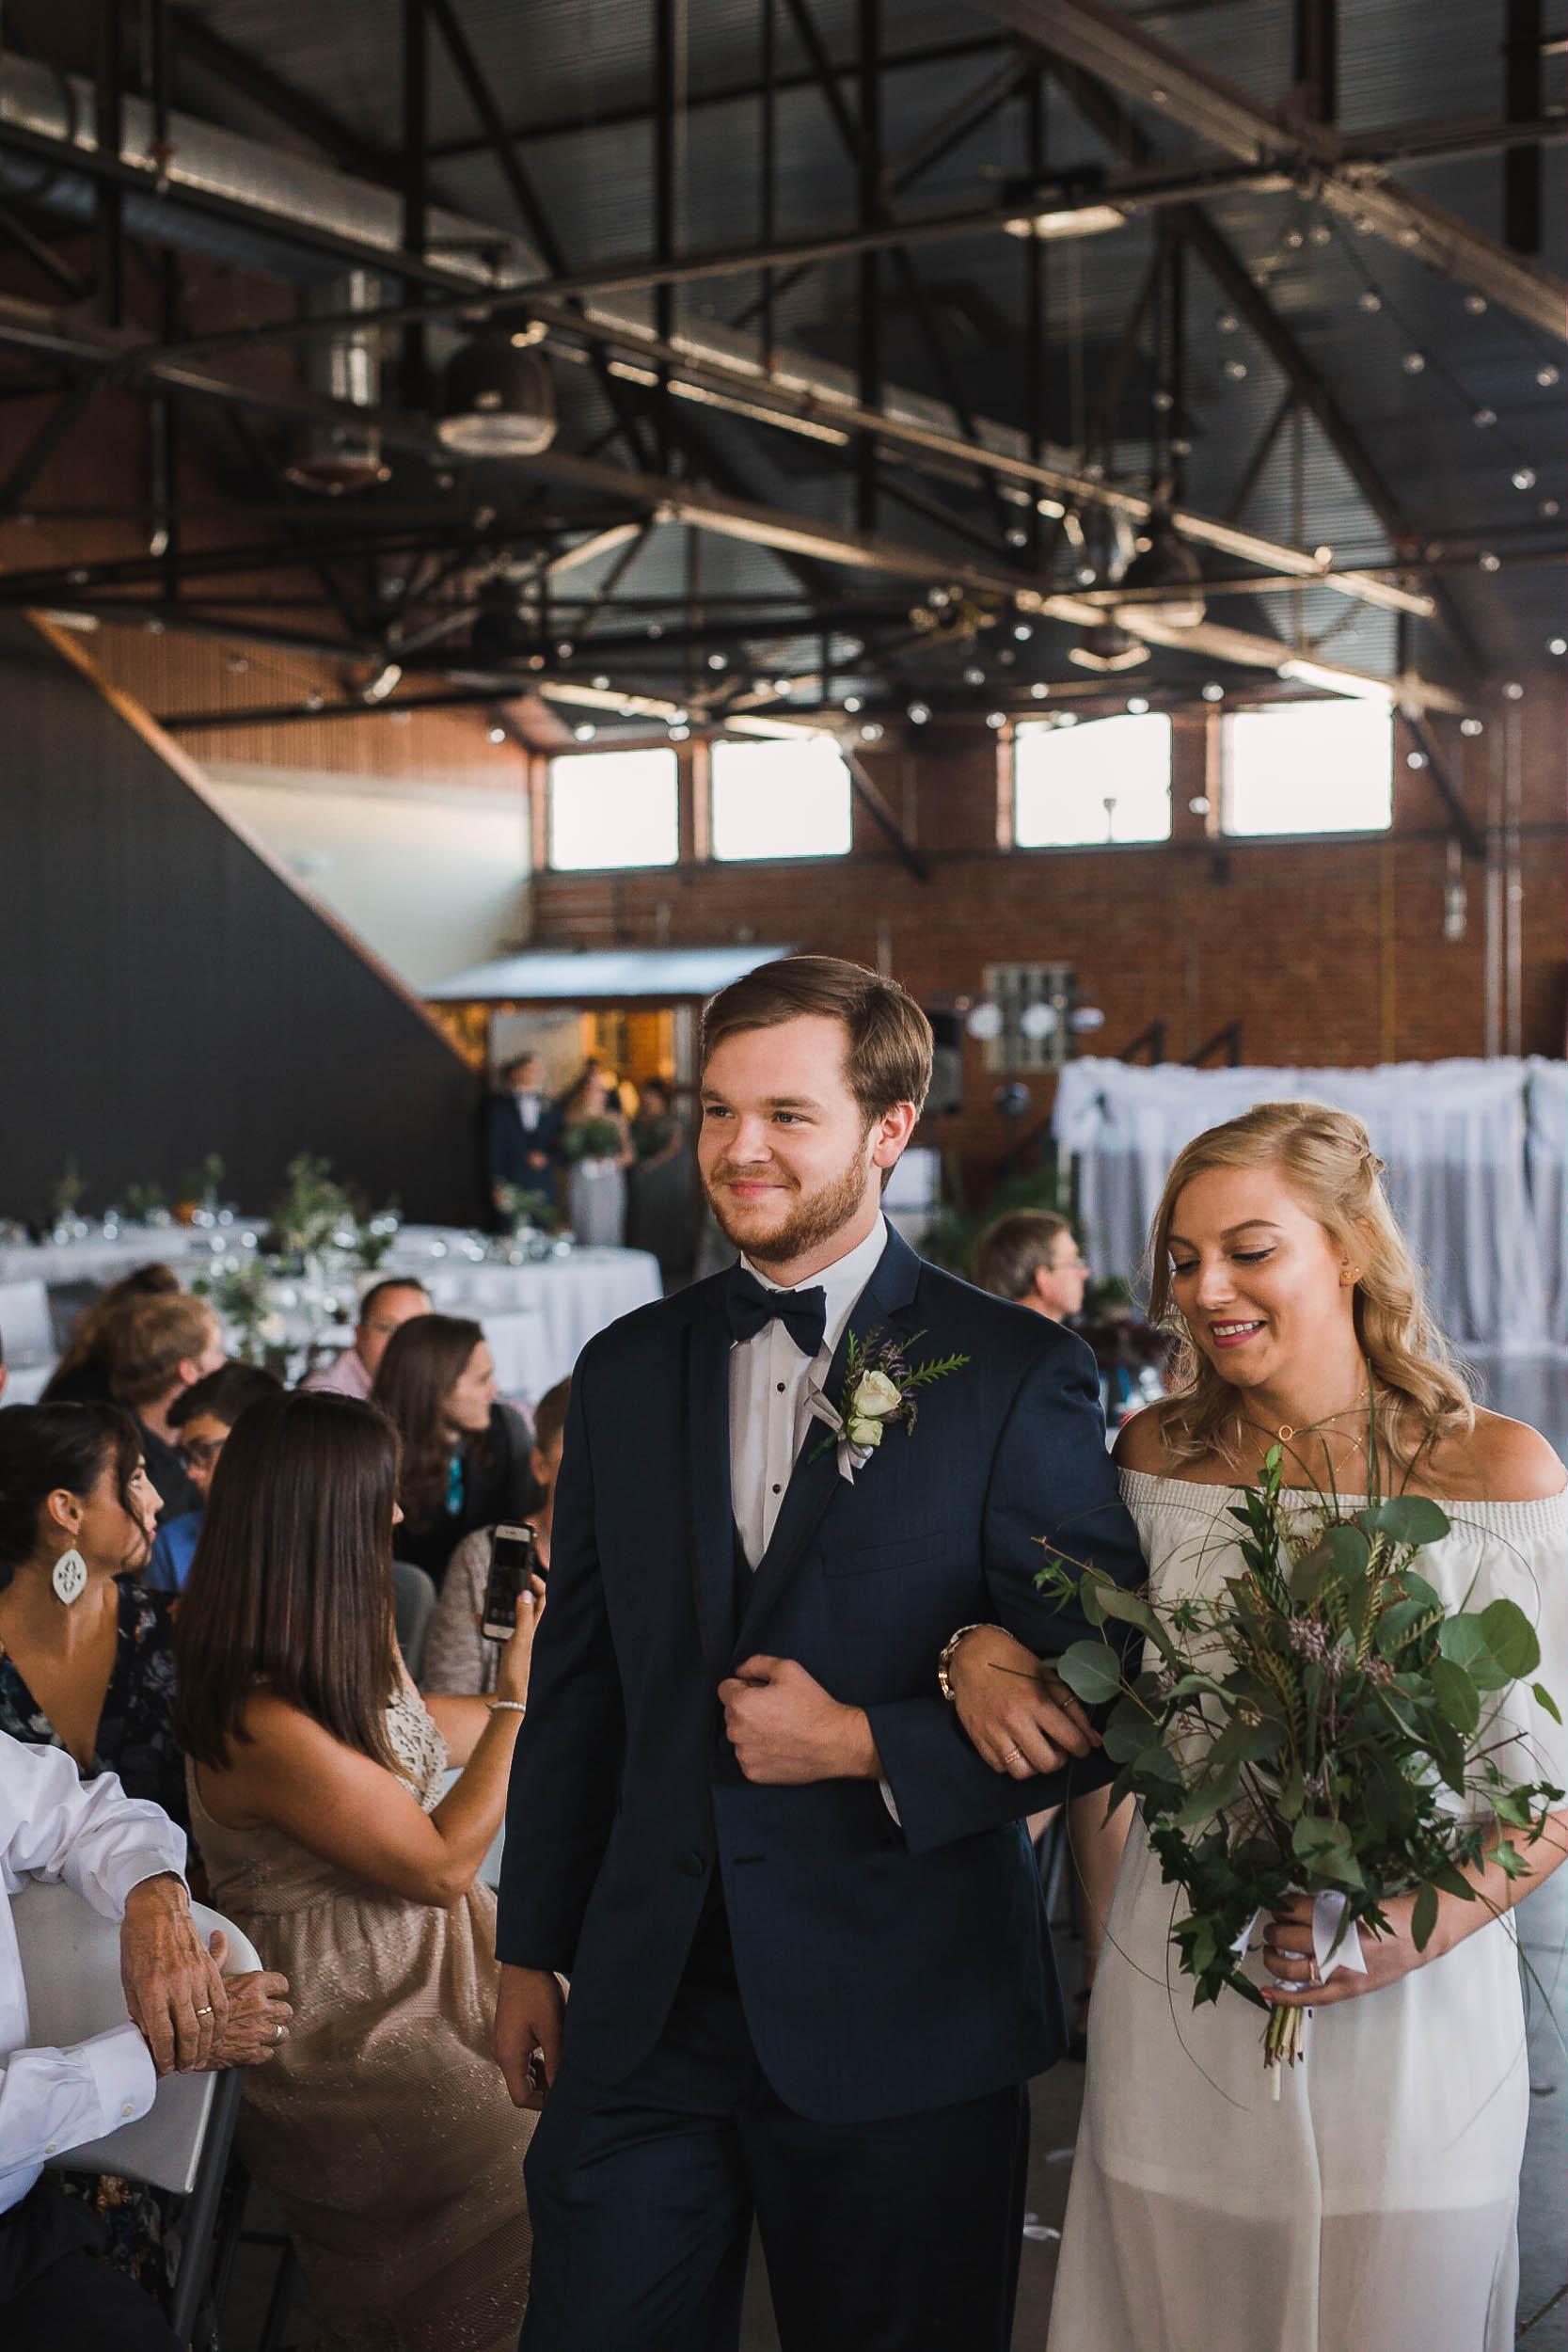 KyleLovesTori-Casper-Wyoming-Wedding-70.jpg